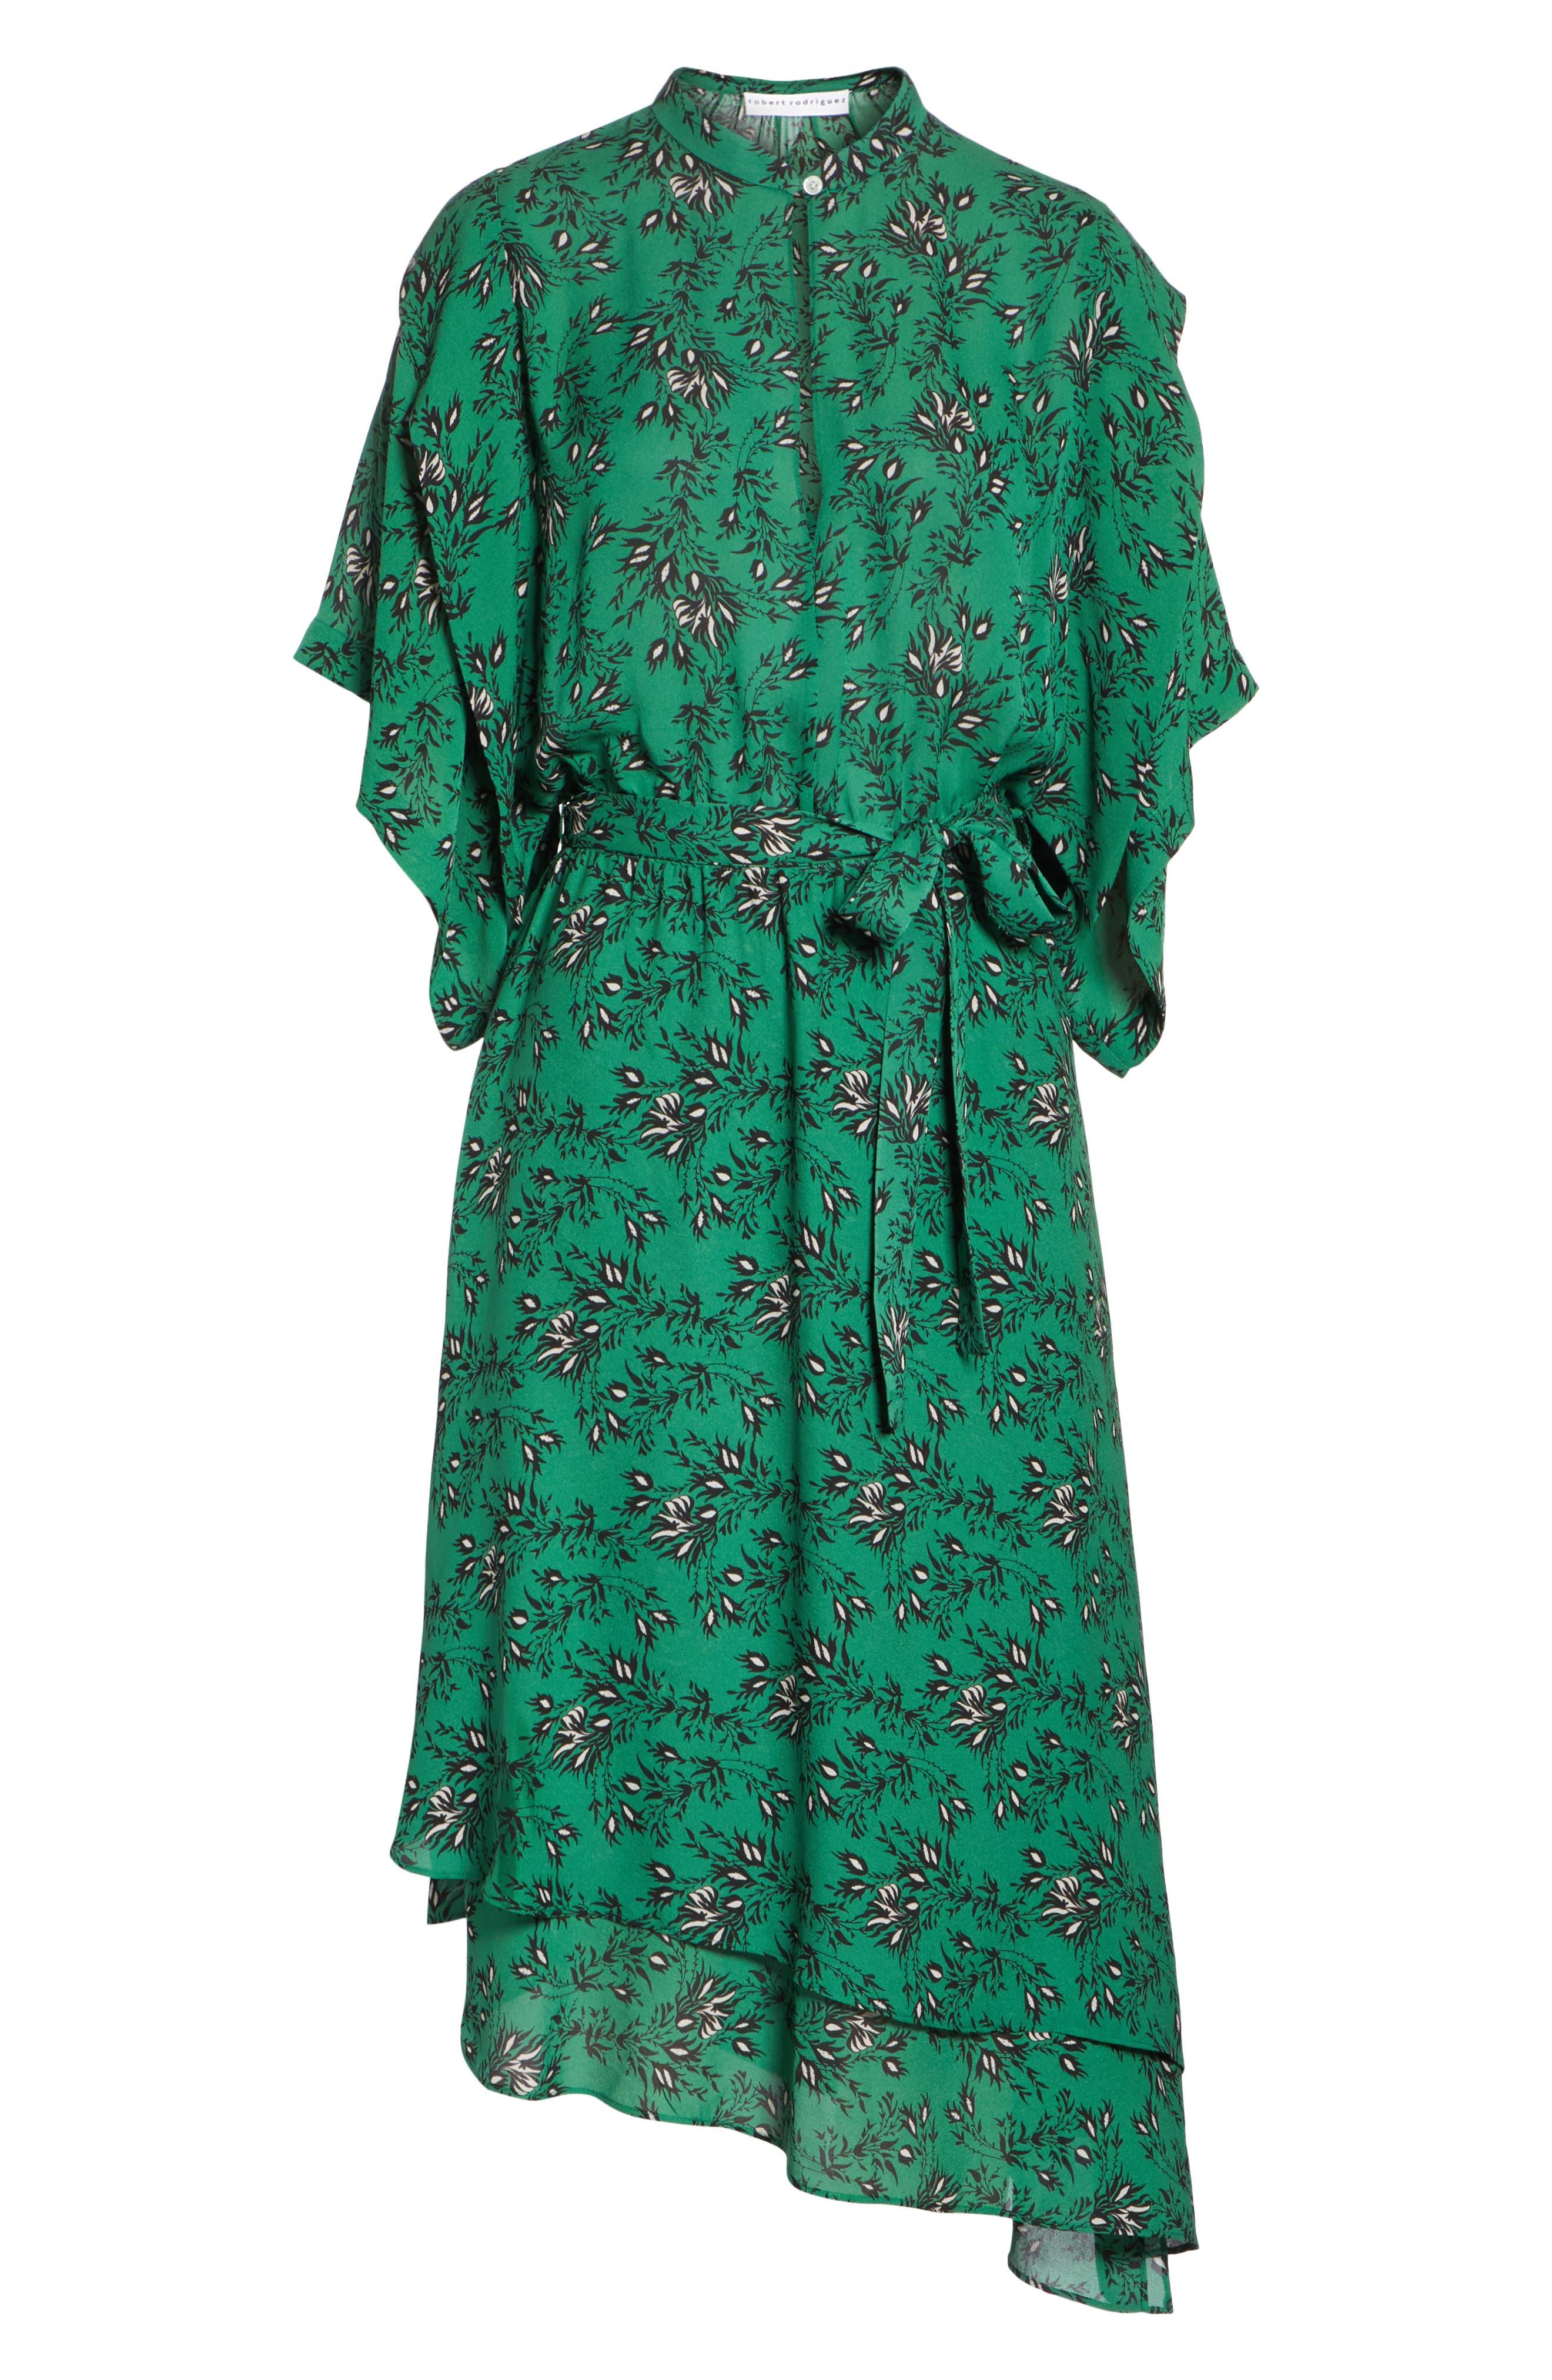 Japanese Floral Midi Dress,                             Alternate thumbnail 6, color,                             EMERALD ORCHID